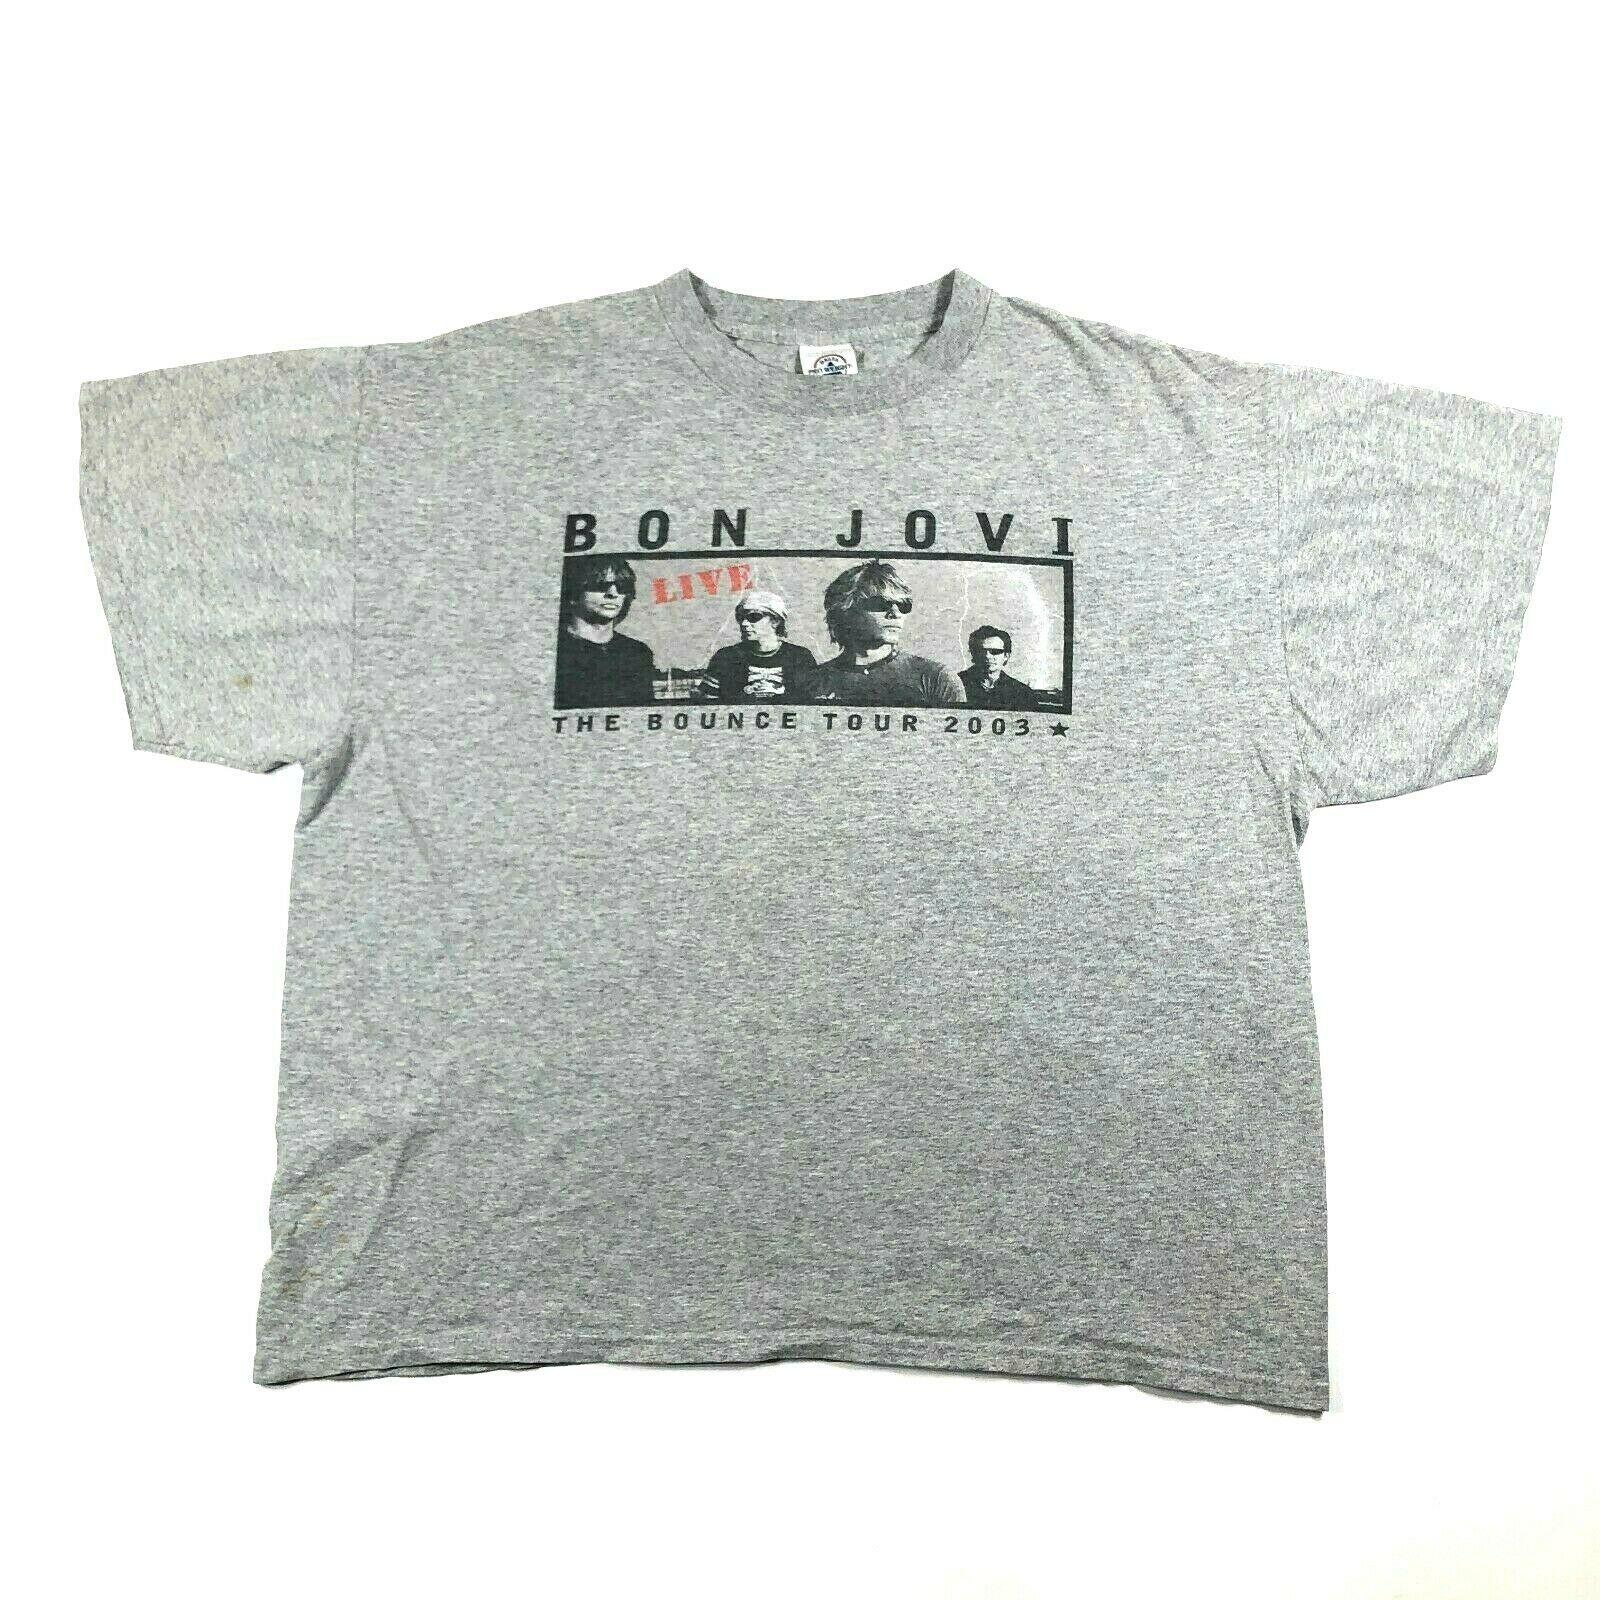 Bon Jovi Bounce 2003 Tour Gray Tee T Shirt Mens XL Boxing Gloves Names - $14.03